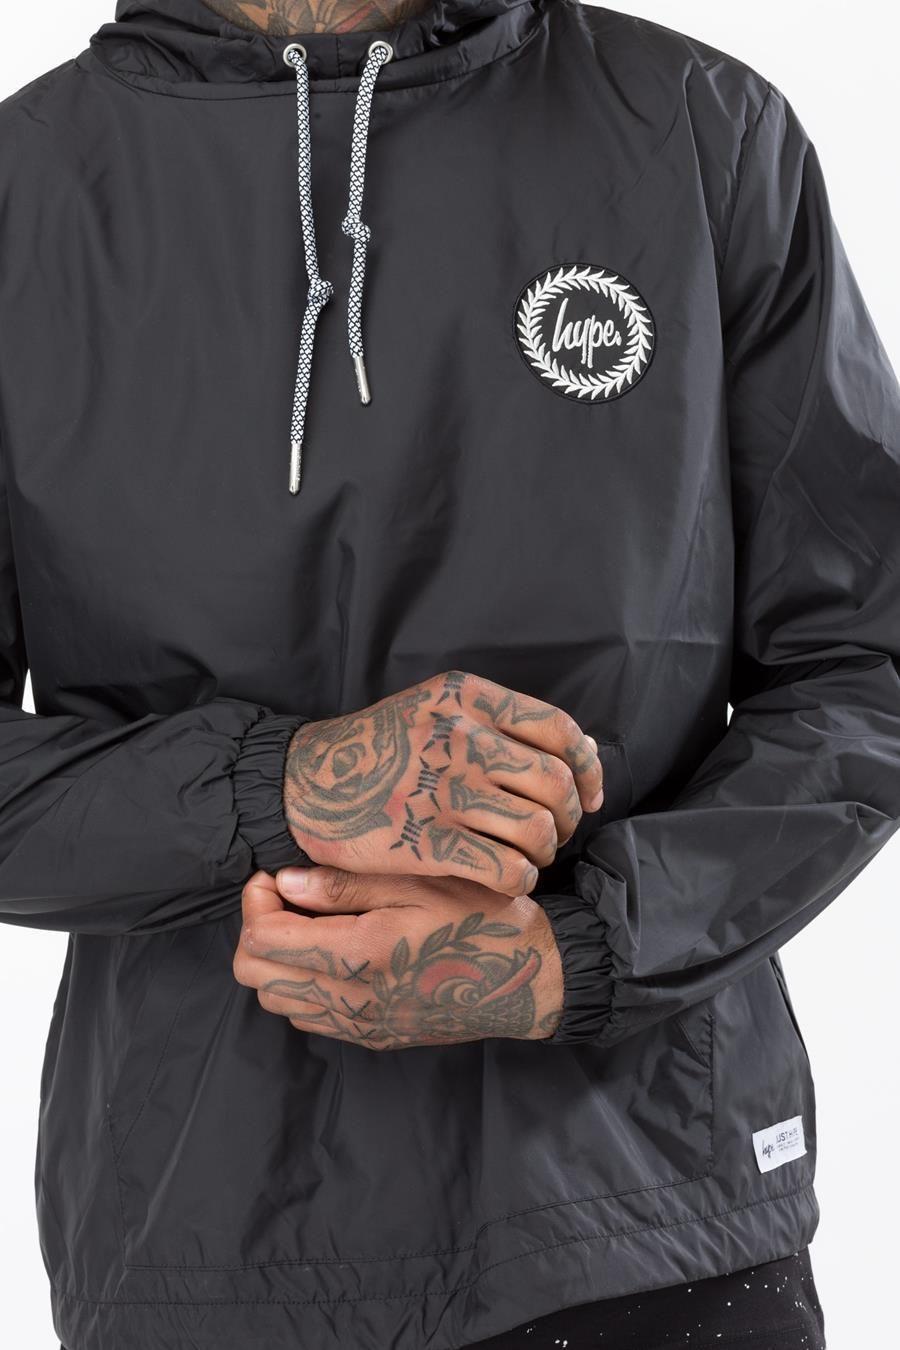 Hype Black Crest Mens Fishtail Jacket